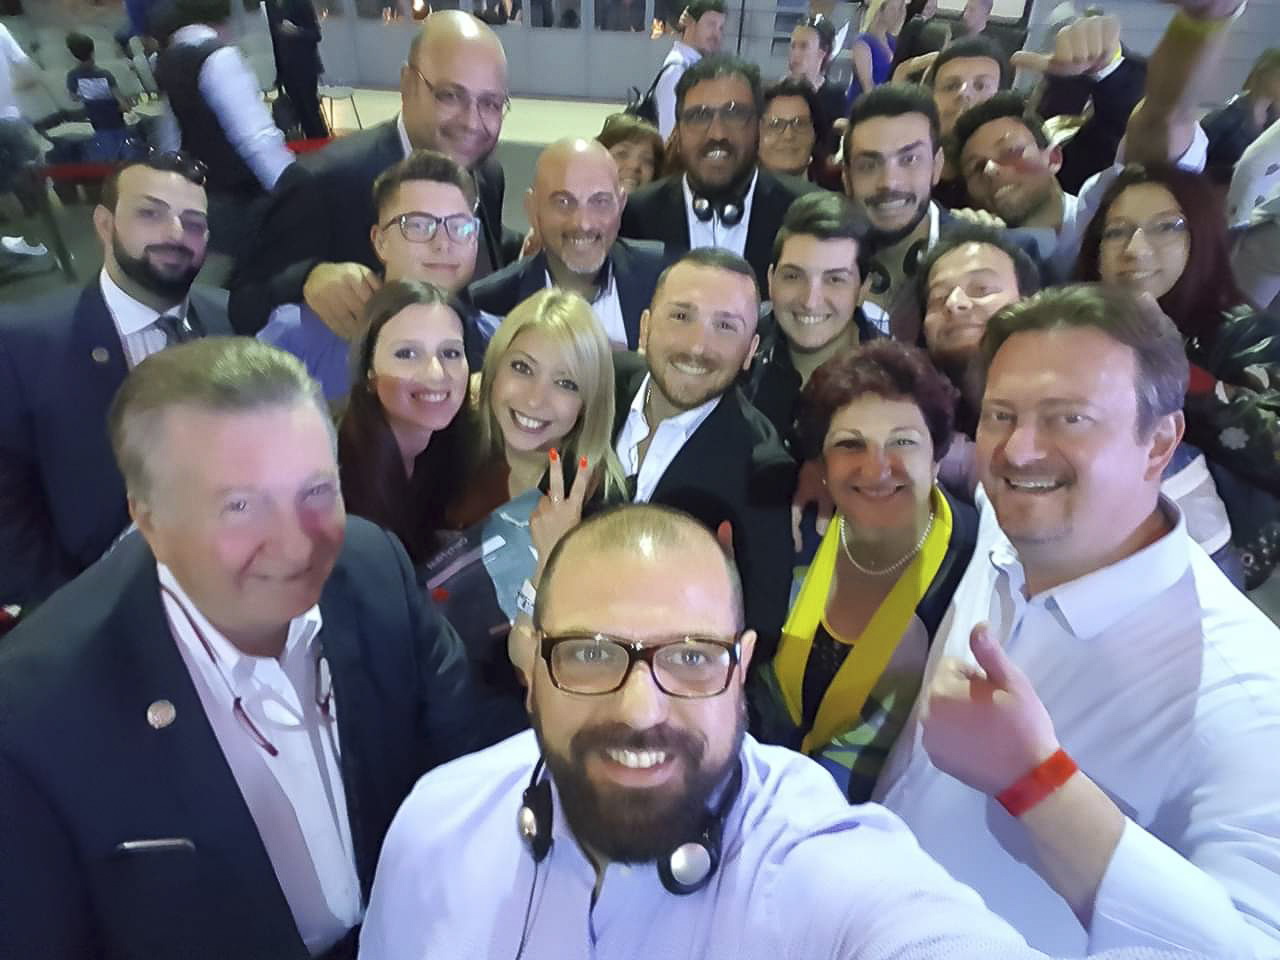 Duolife_Cavarra_Team_Corrado_Cavarra_Noto_Networker00105